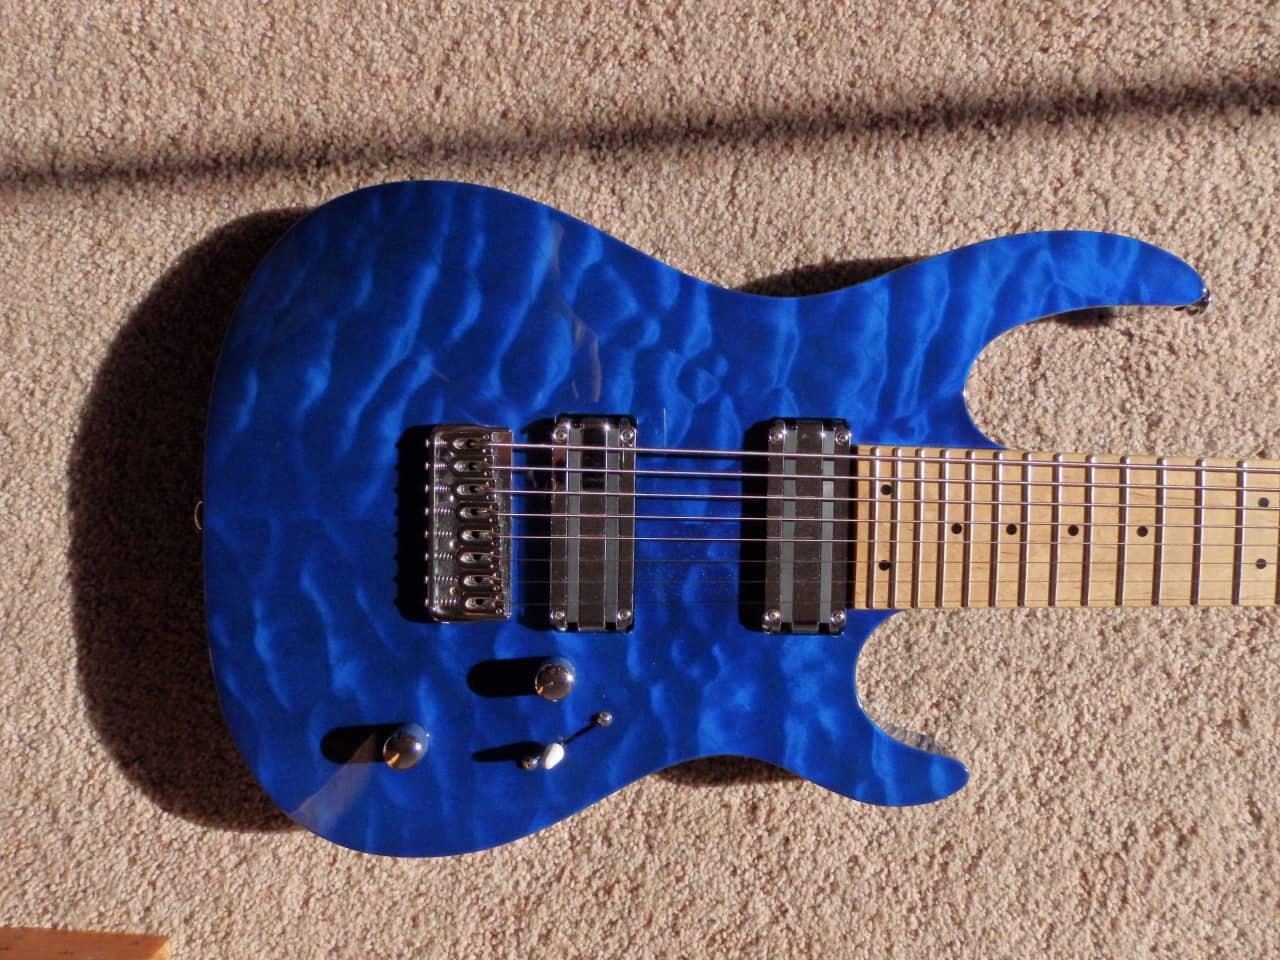 Delapan Musik Tas Gitar Elektrik Blue Daftar Harga Terkini Varetta Black Hitam L Carvin Dc800 8 String Guitar